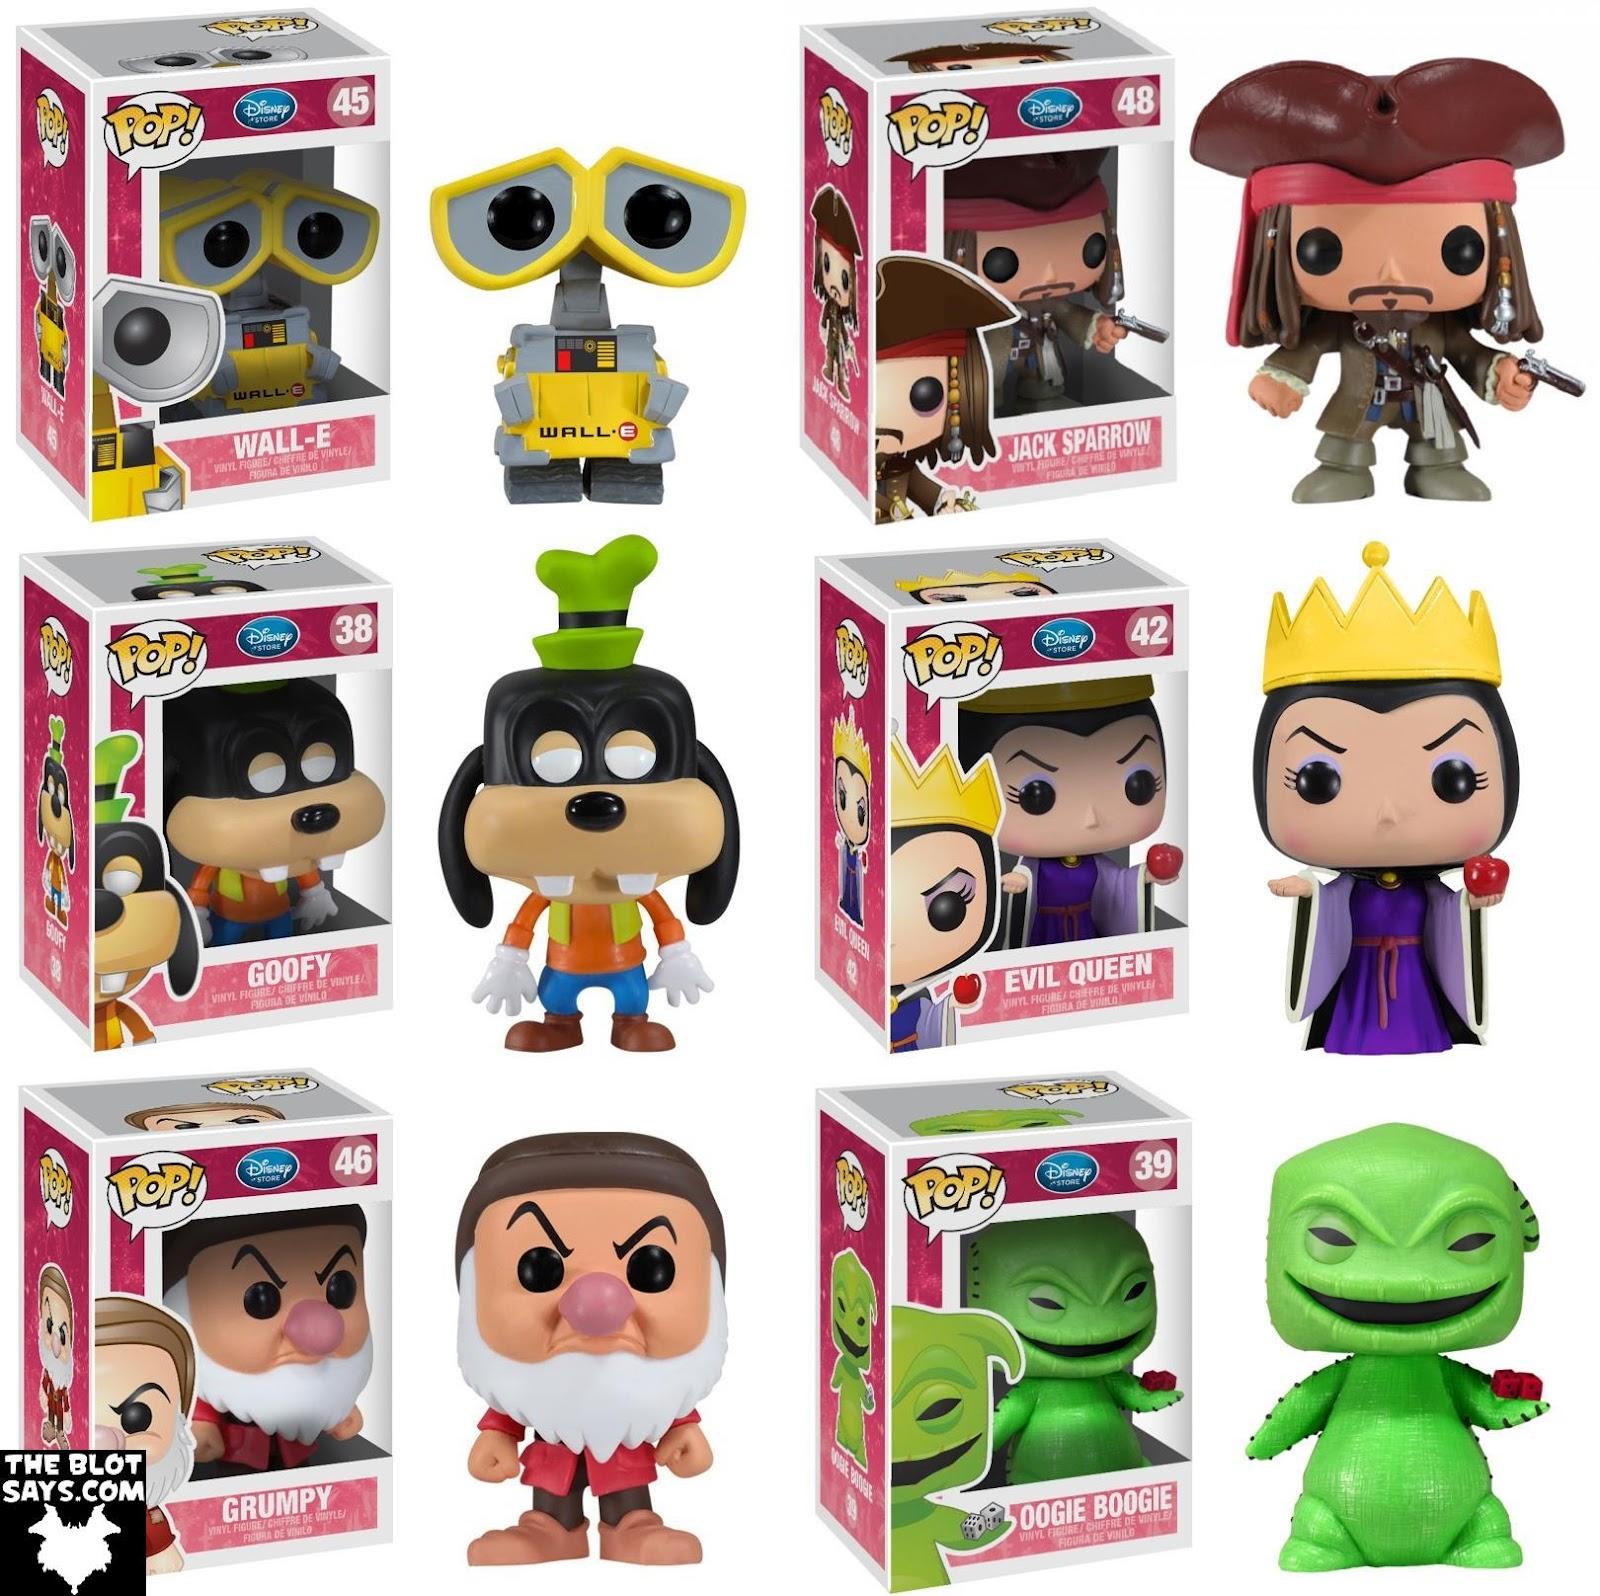 The Blot Says First Look Disney Pop Series 4 Part Ii By Funko Bott Emperors Kronk Vinyl Figures Walle Jack Sparrow